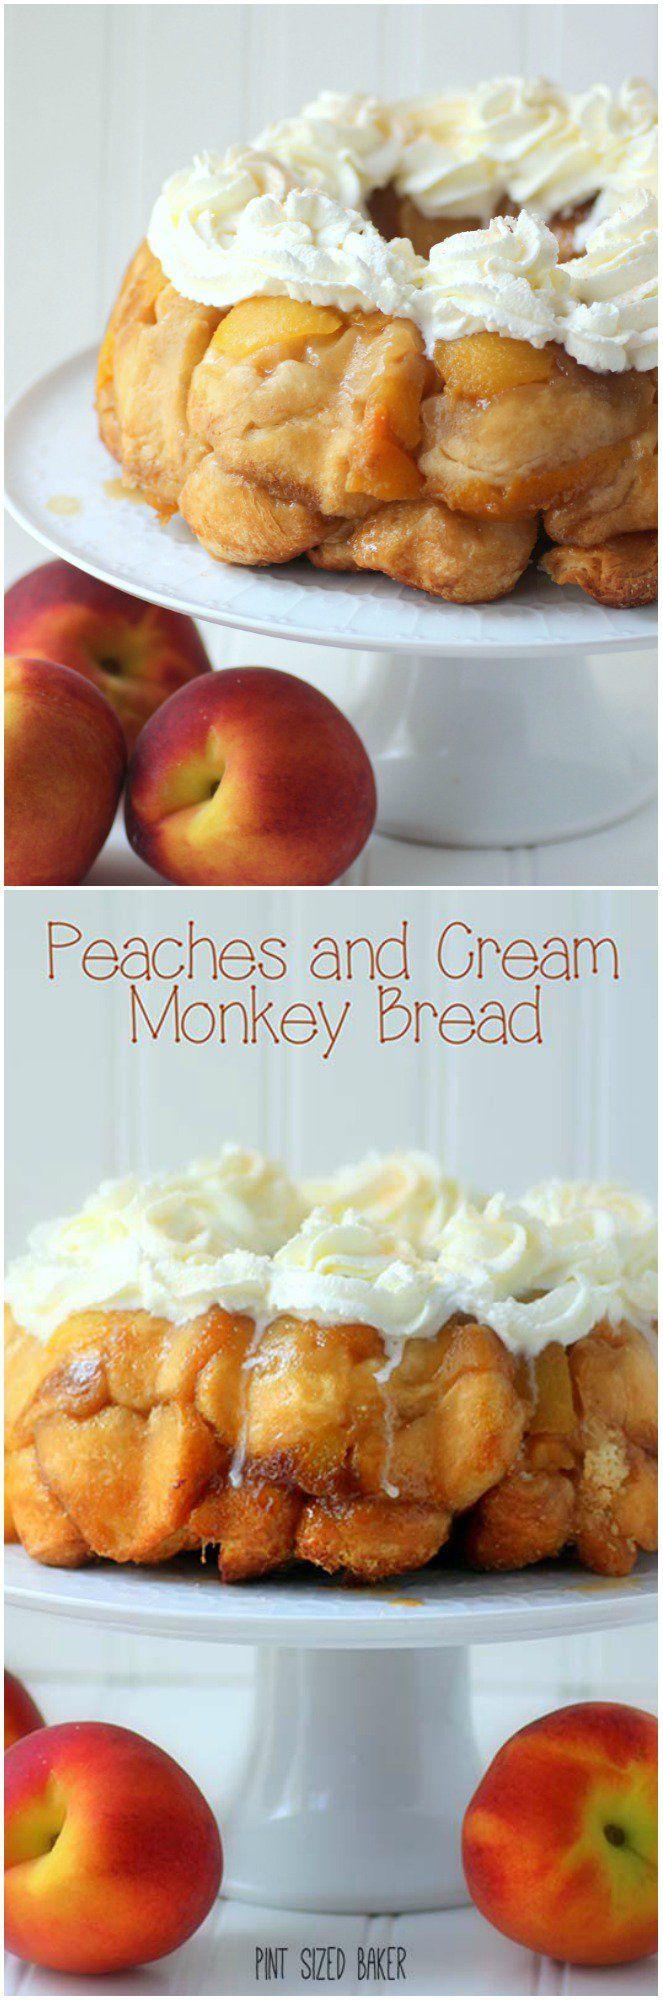 Peaches and Cream Monkey Bread